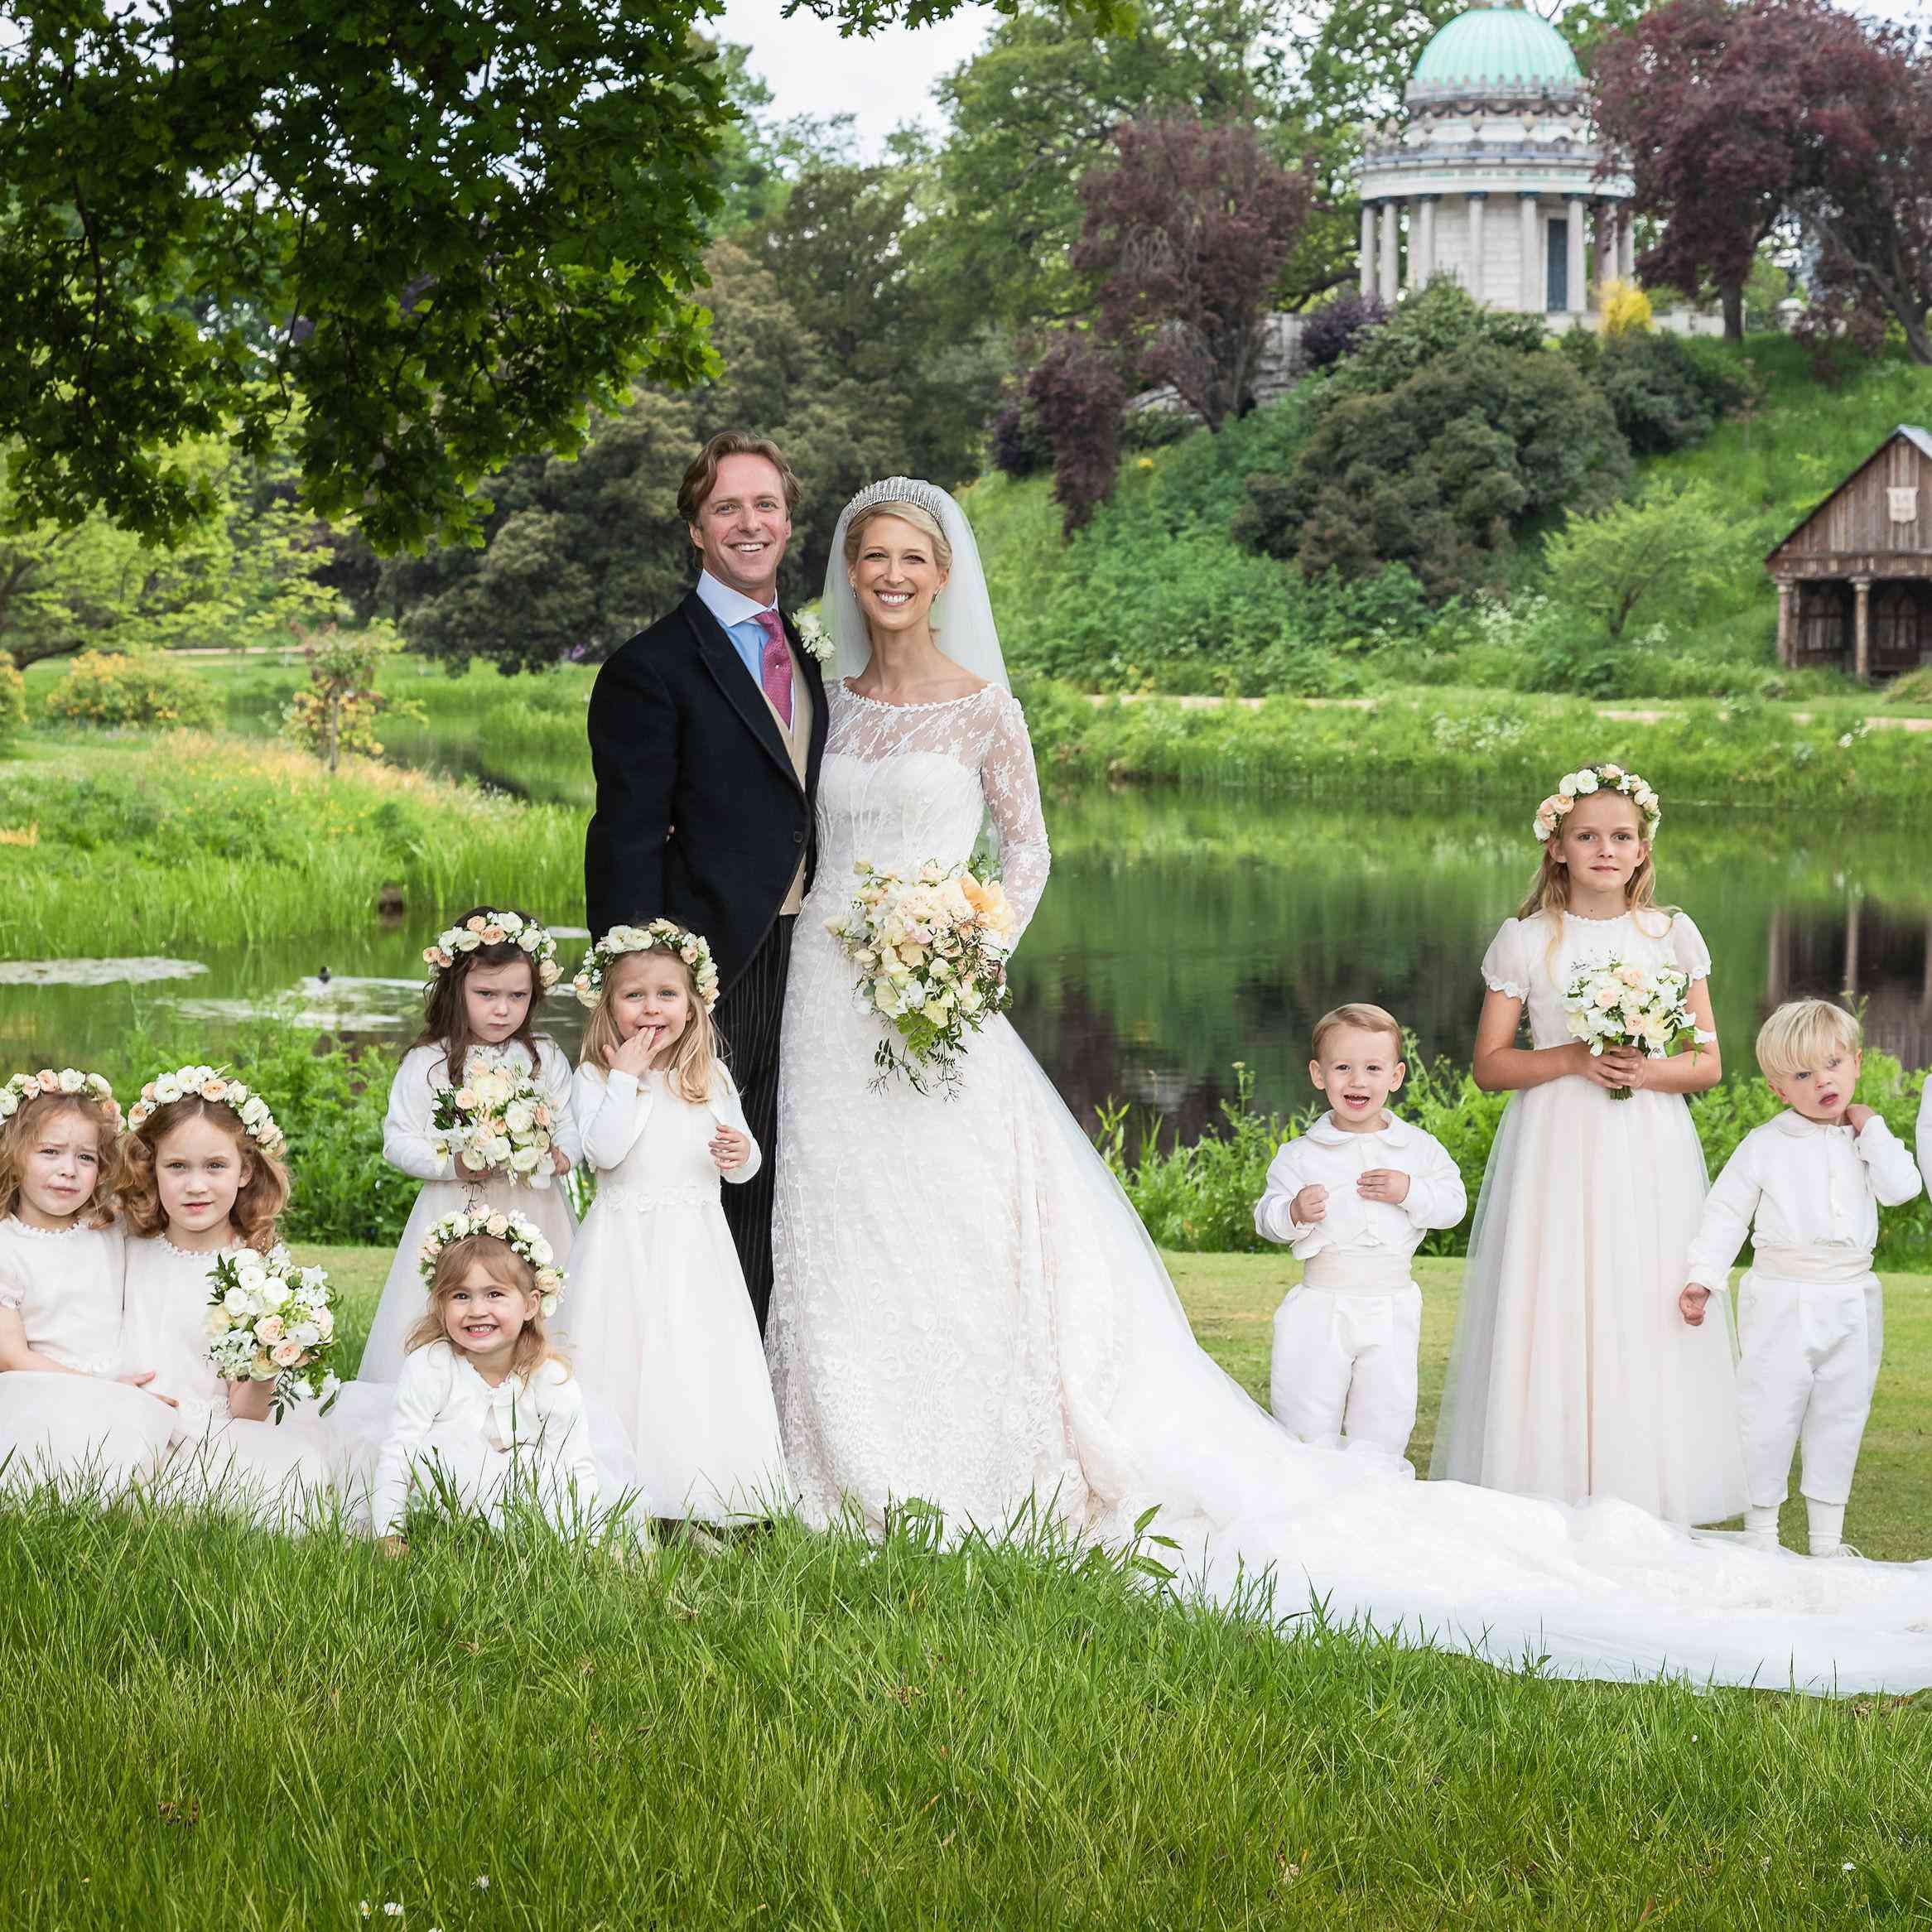 Lady Gabriella Windsor And Thomas Kingston's Royal Wedding